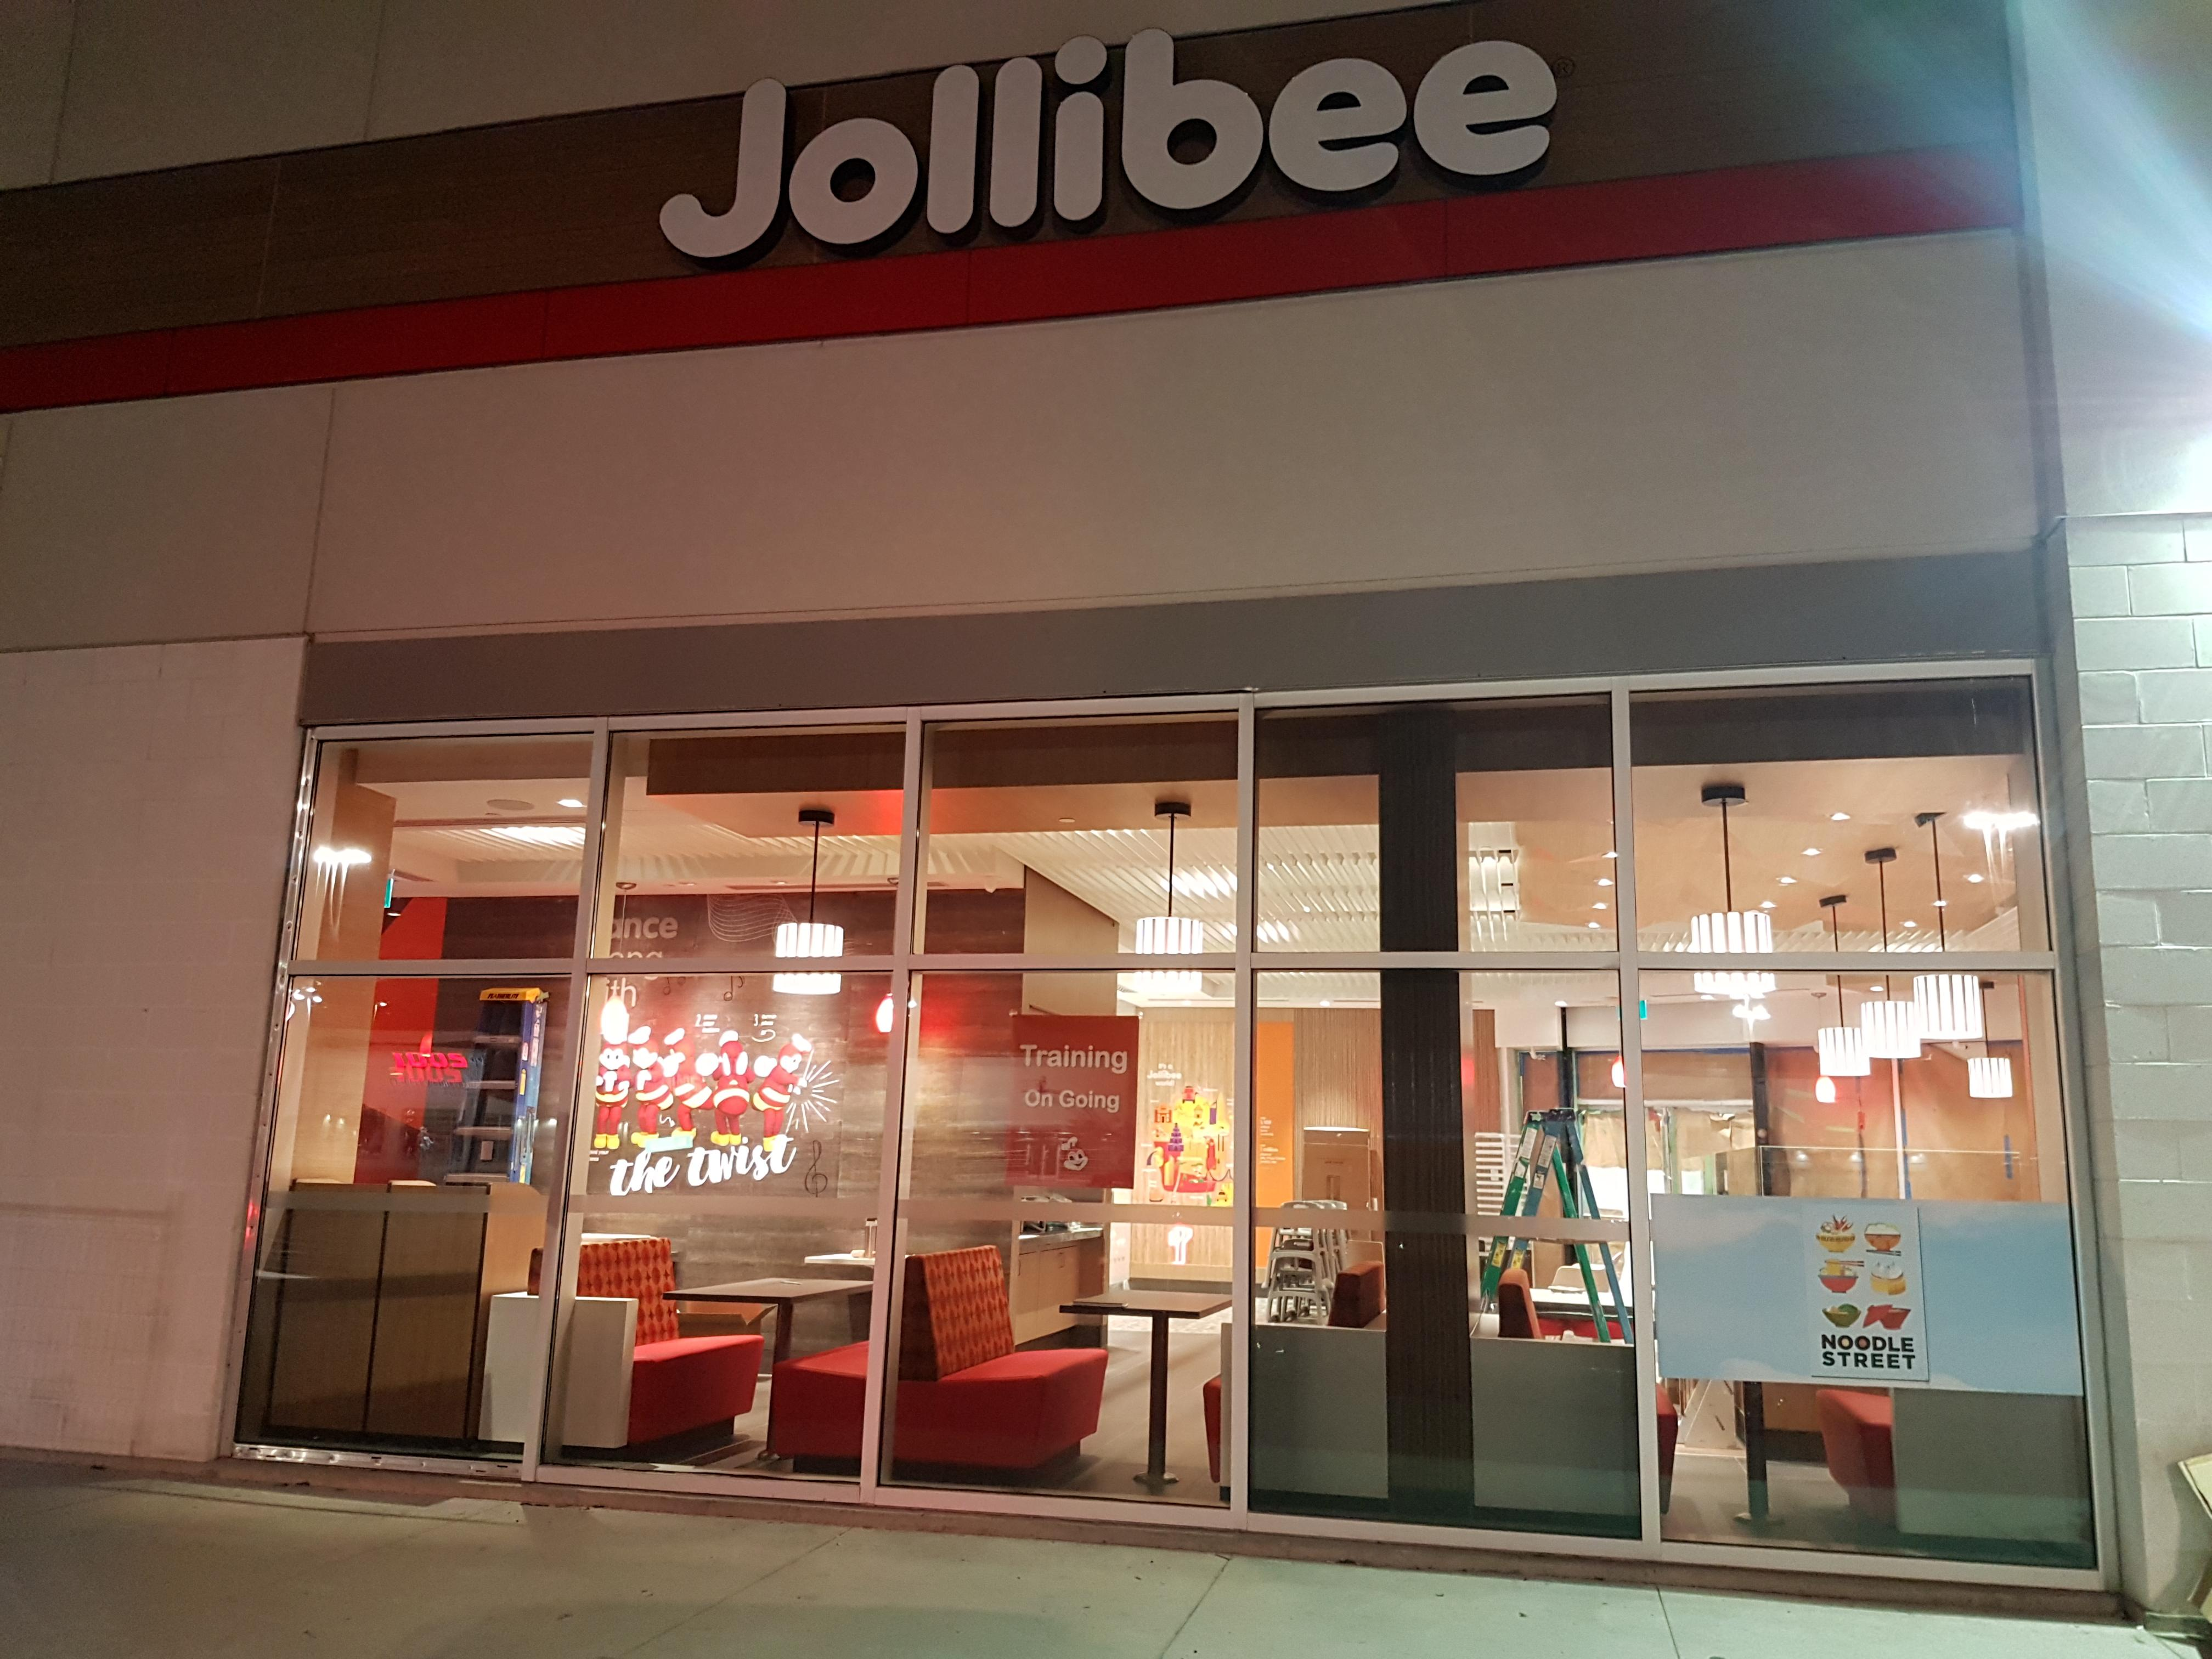 Jollibee must be opening imminently! : mississauga